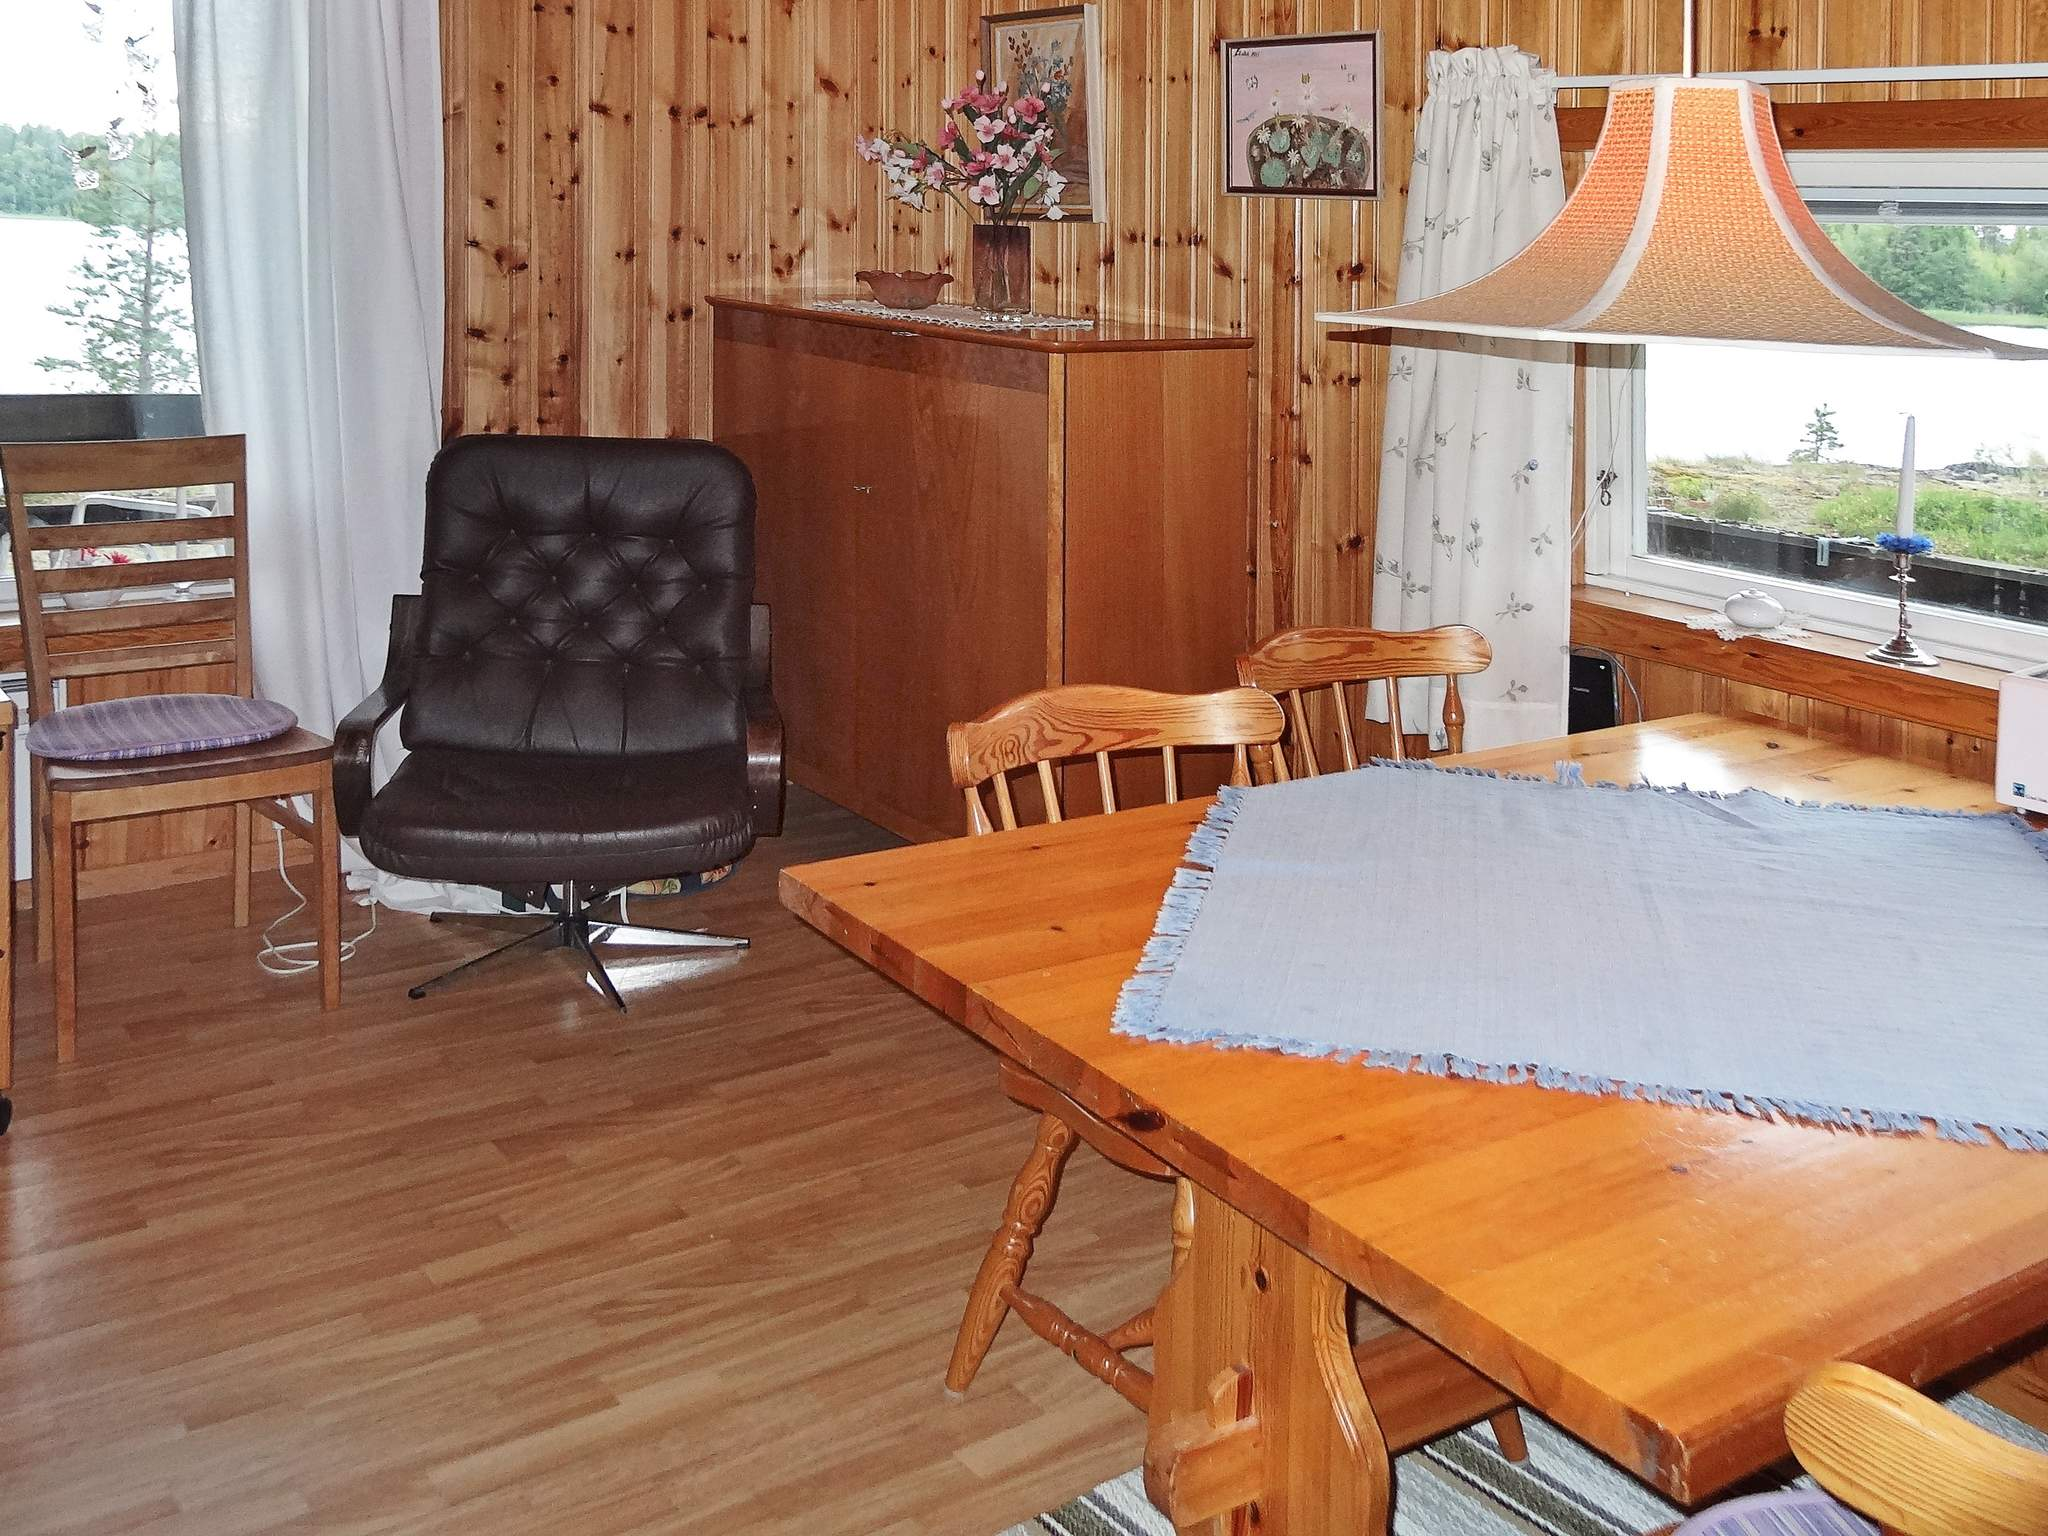 Ferienhaus Nordmaling (1026050), Lögdeå, Västerbottens län, Nordschweden, Schweden, Bild 4